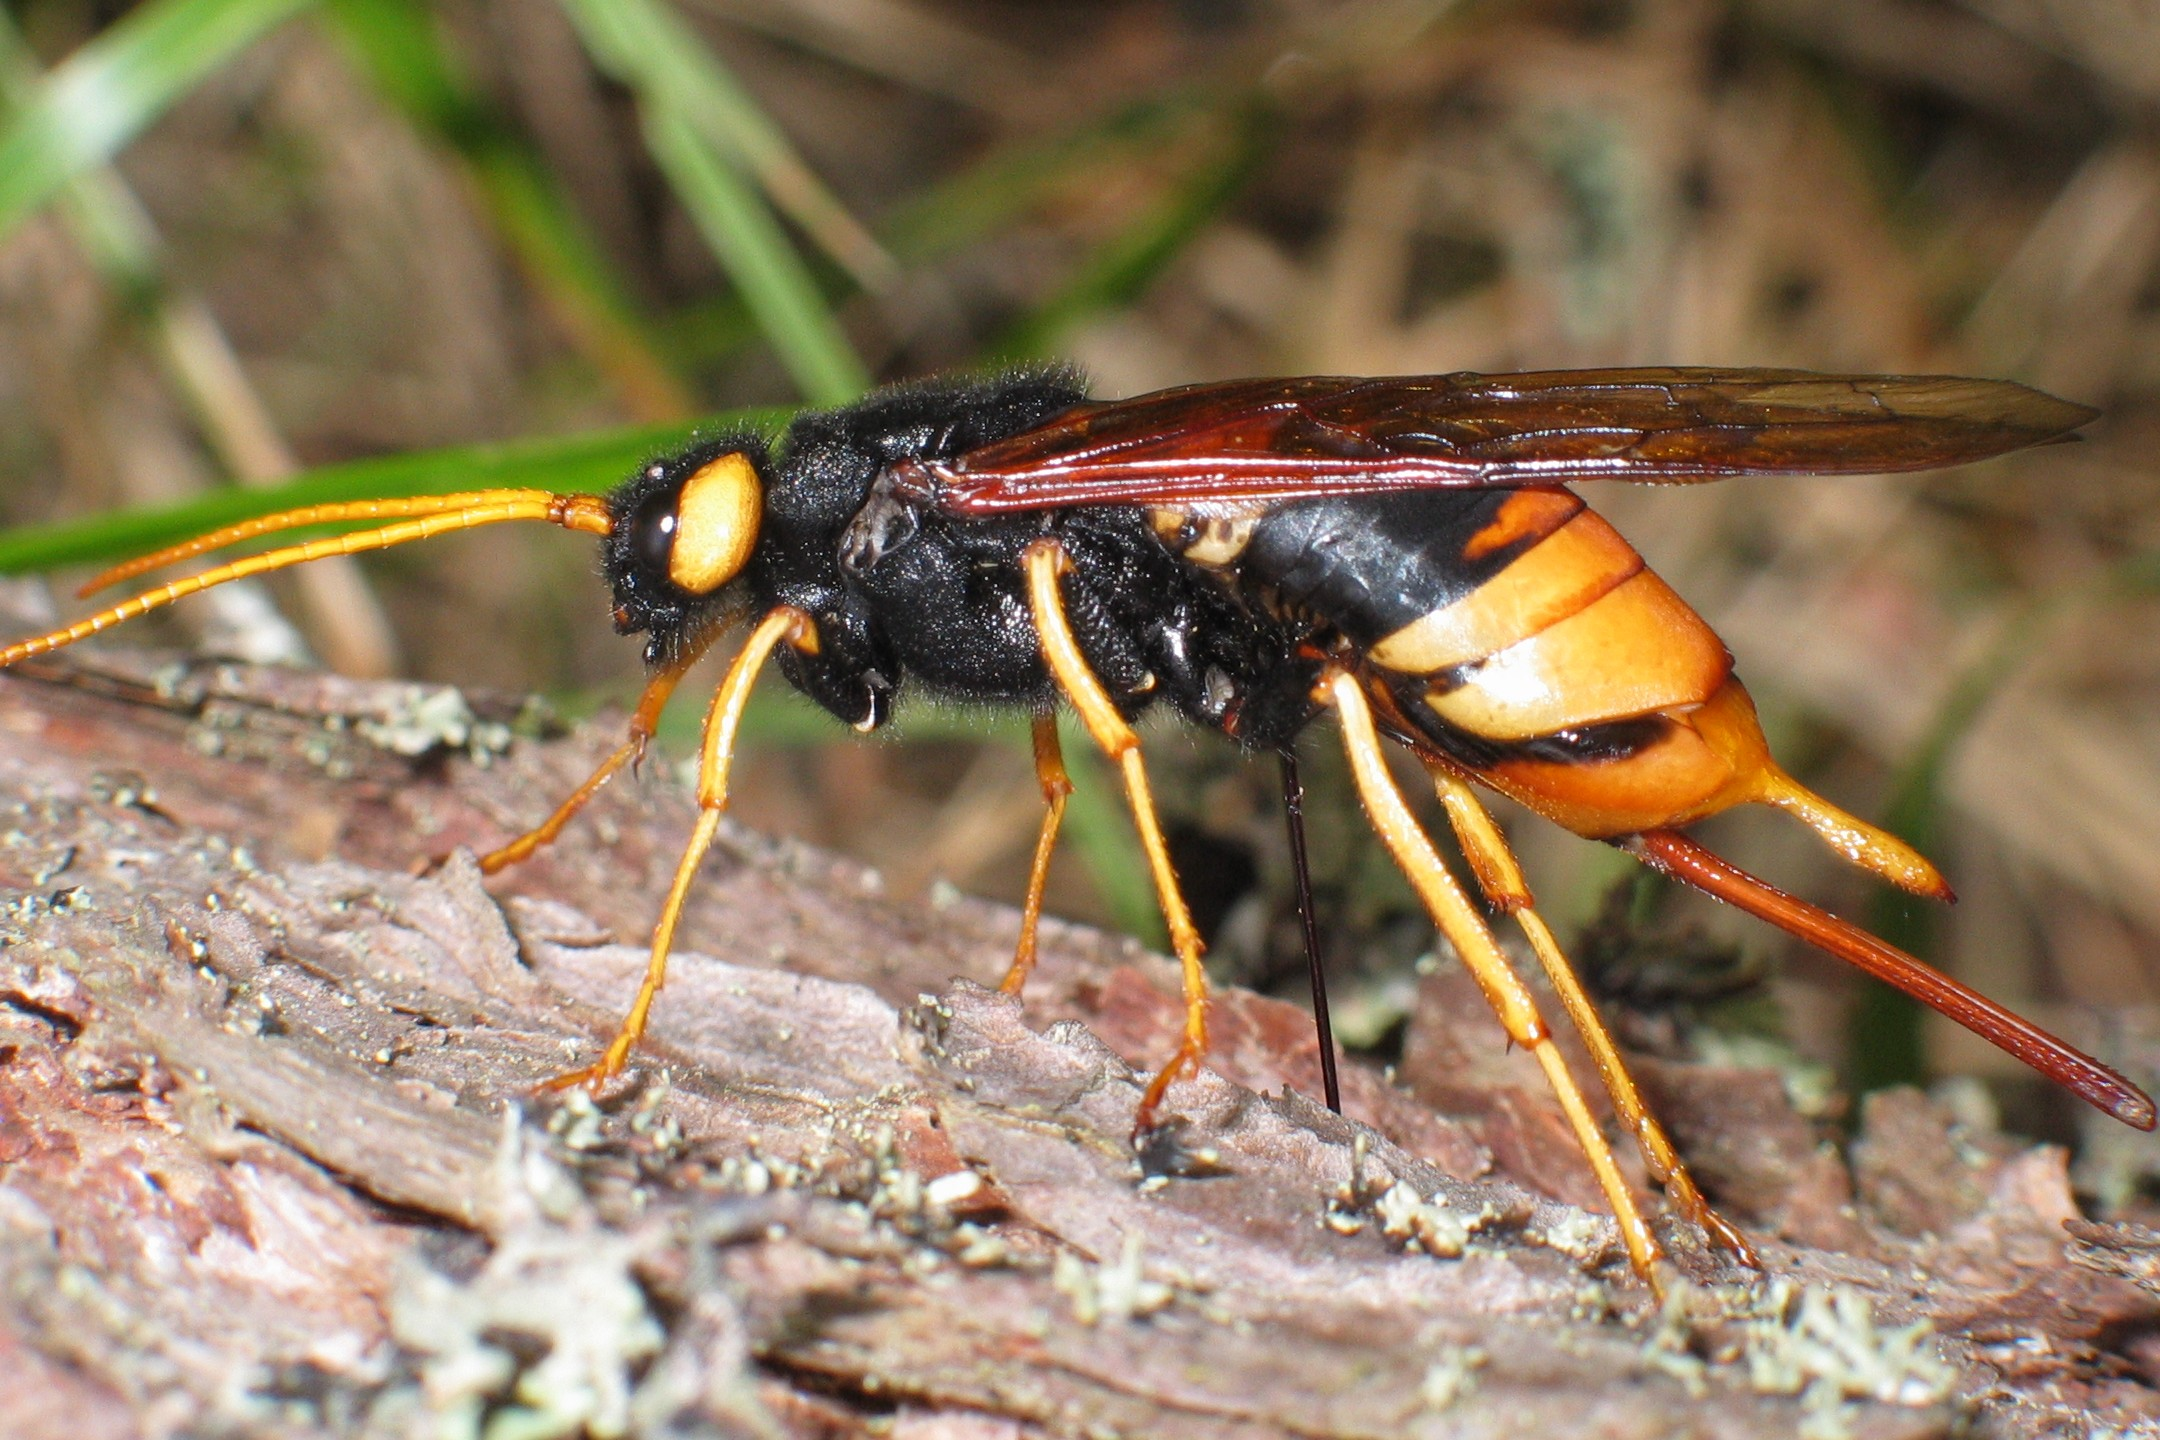 hornisse wespe biene mit stachel so lang wie der k rper tiere biologie insekten. Black Bedroom Furniture Sets. Home Design Ideas